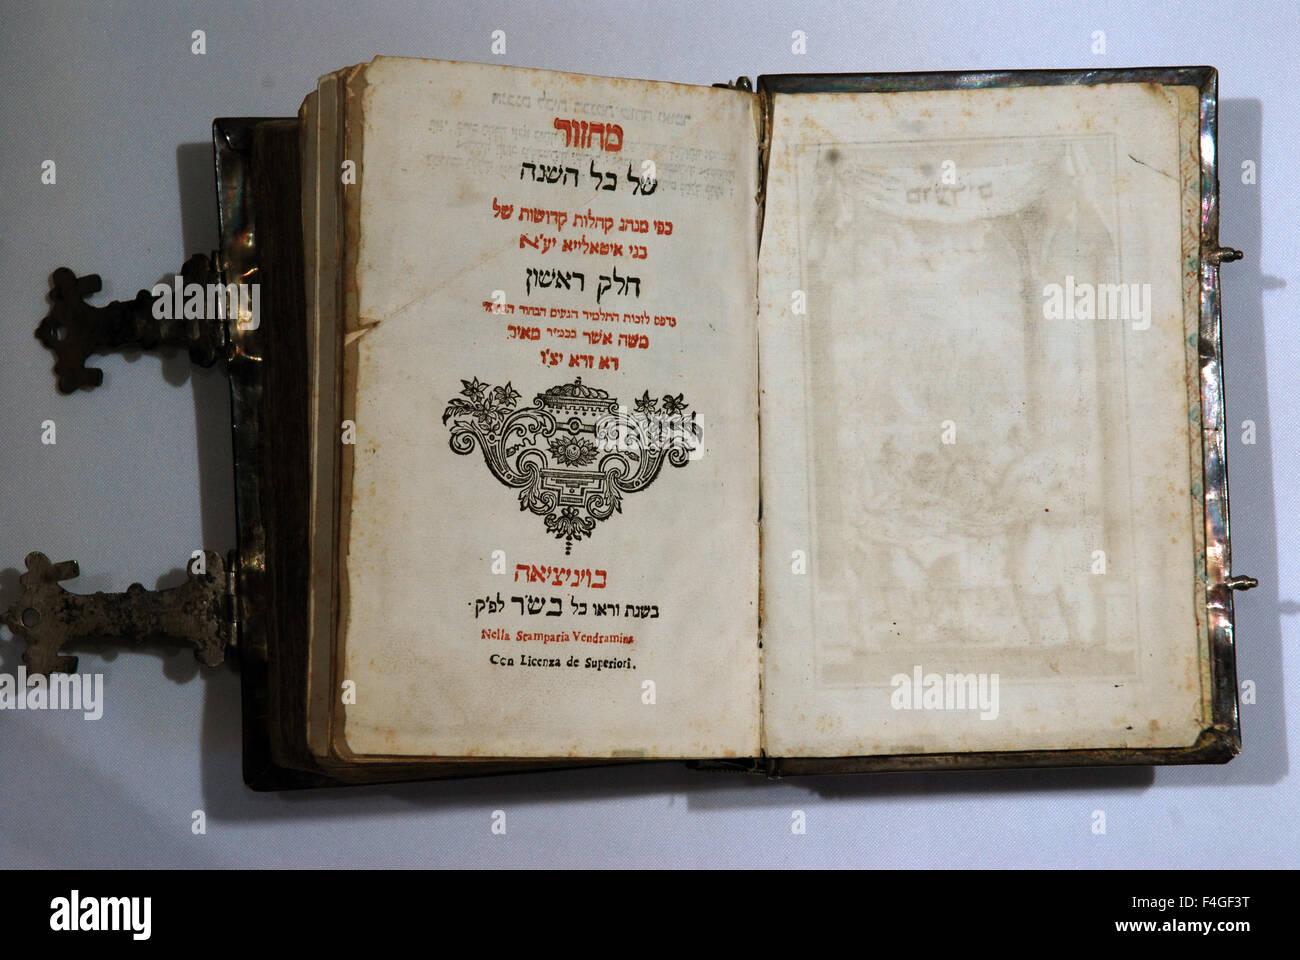 5633-Hebrew book of all year prayers (mahzor), Italy 18th. C. - Stock Image